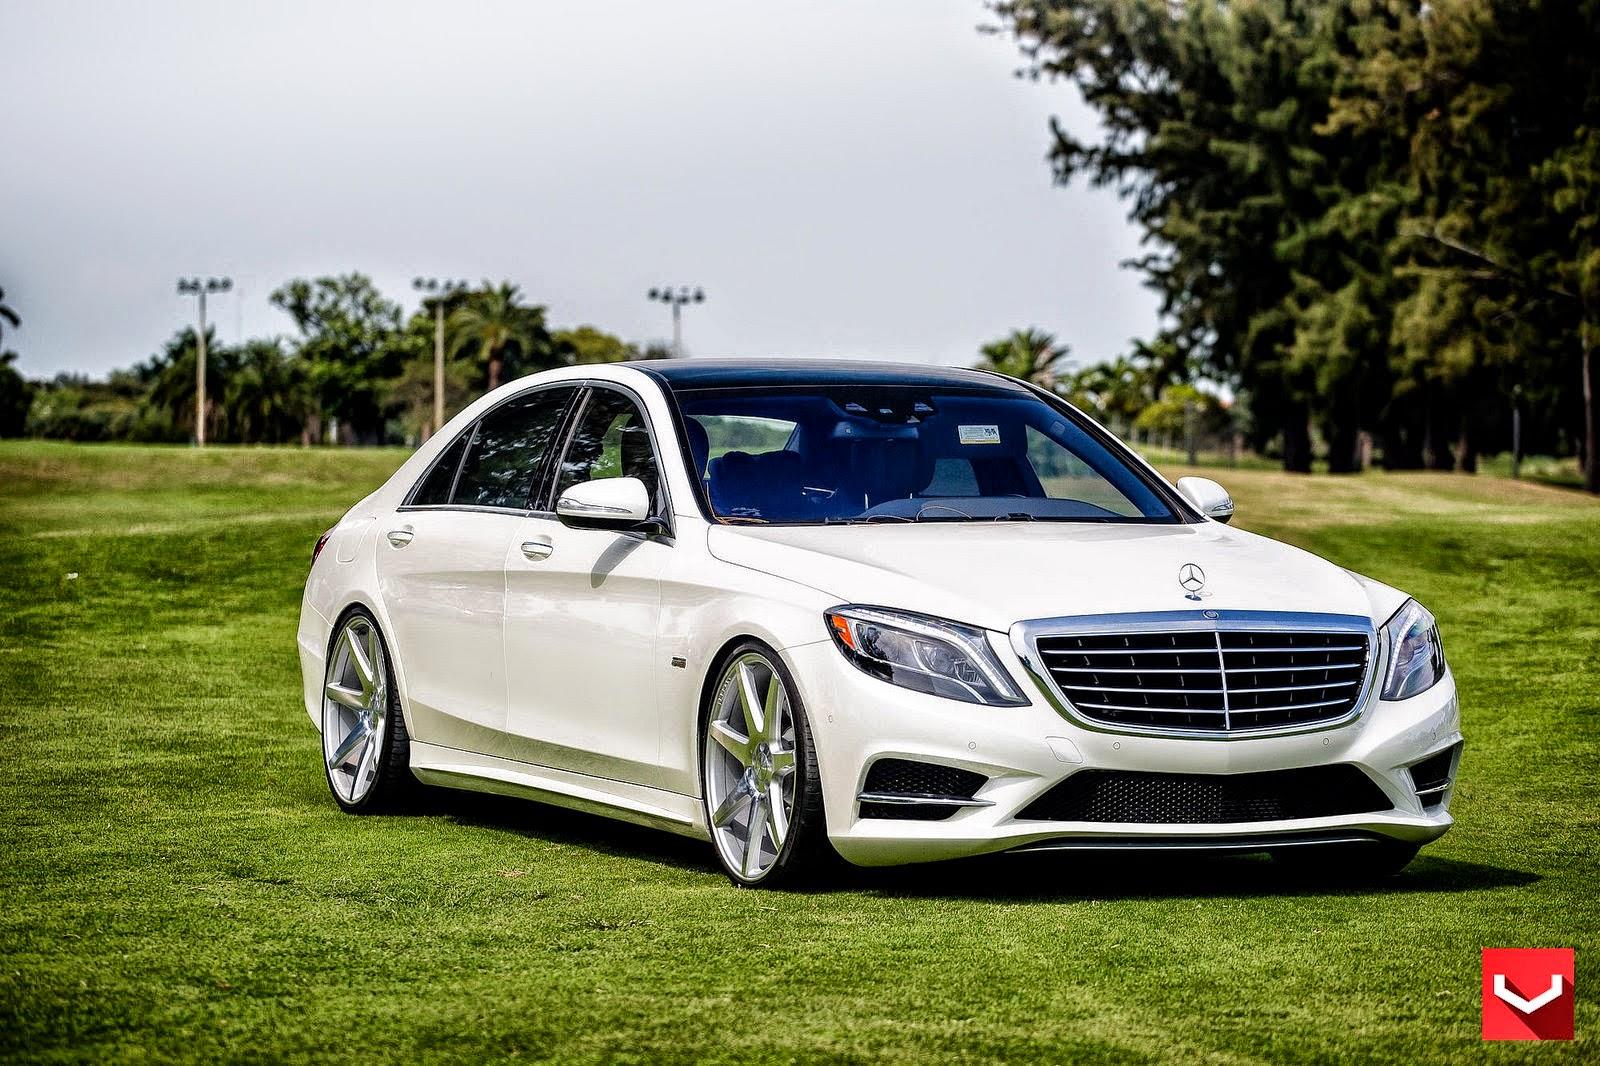 Mercedes 6x6 For Sale >> Mercedes-Benz W222 S550 on Vossen CV7 Wheels | BENZTUNING